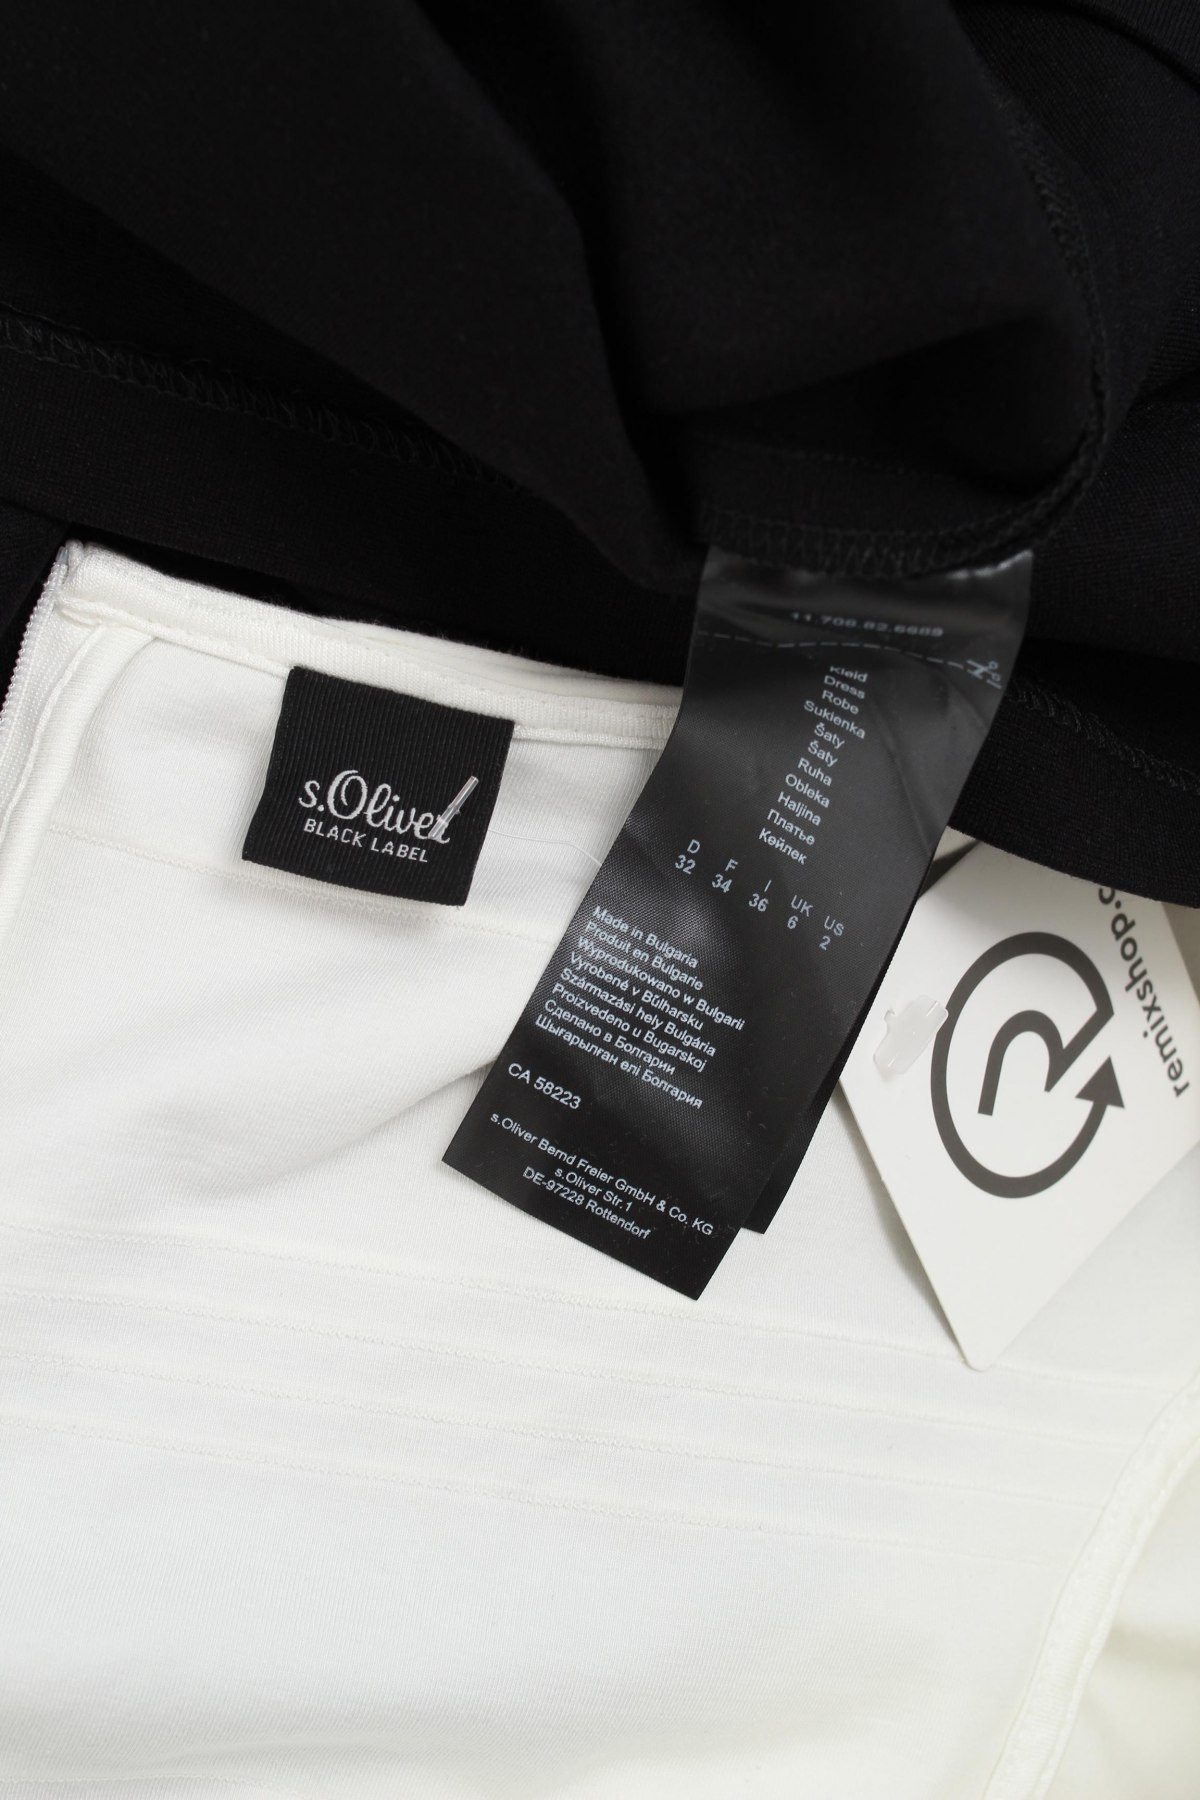 online for sale various design authentic Sukienka S.Oliver - kup w korzystnych cenach na Remix ...